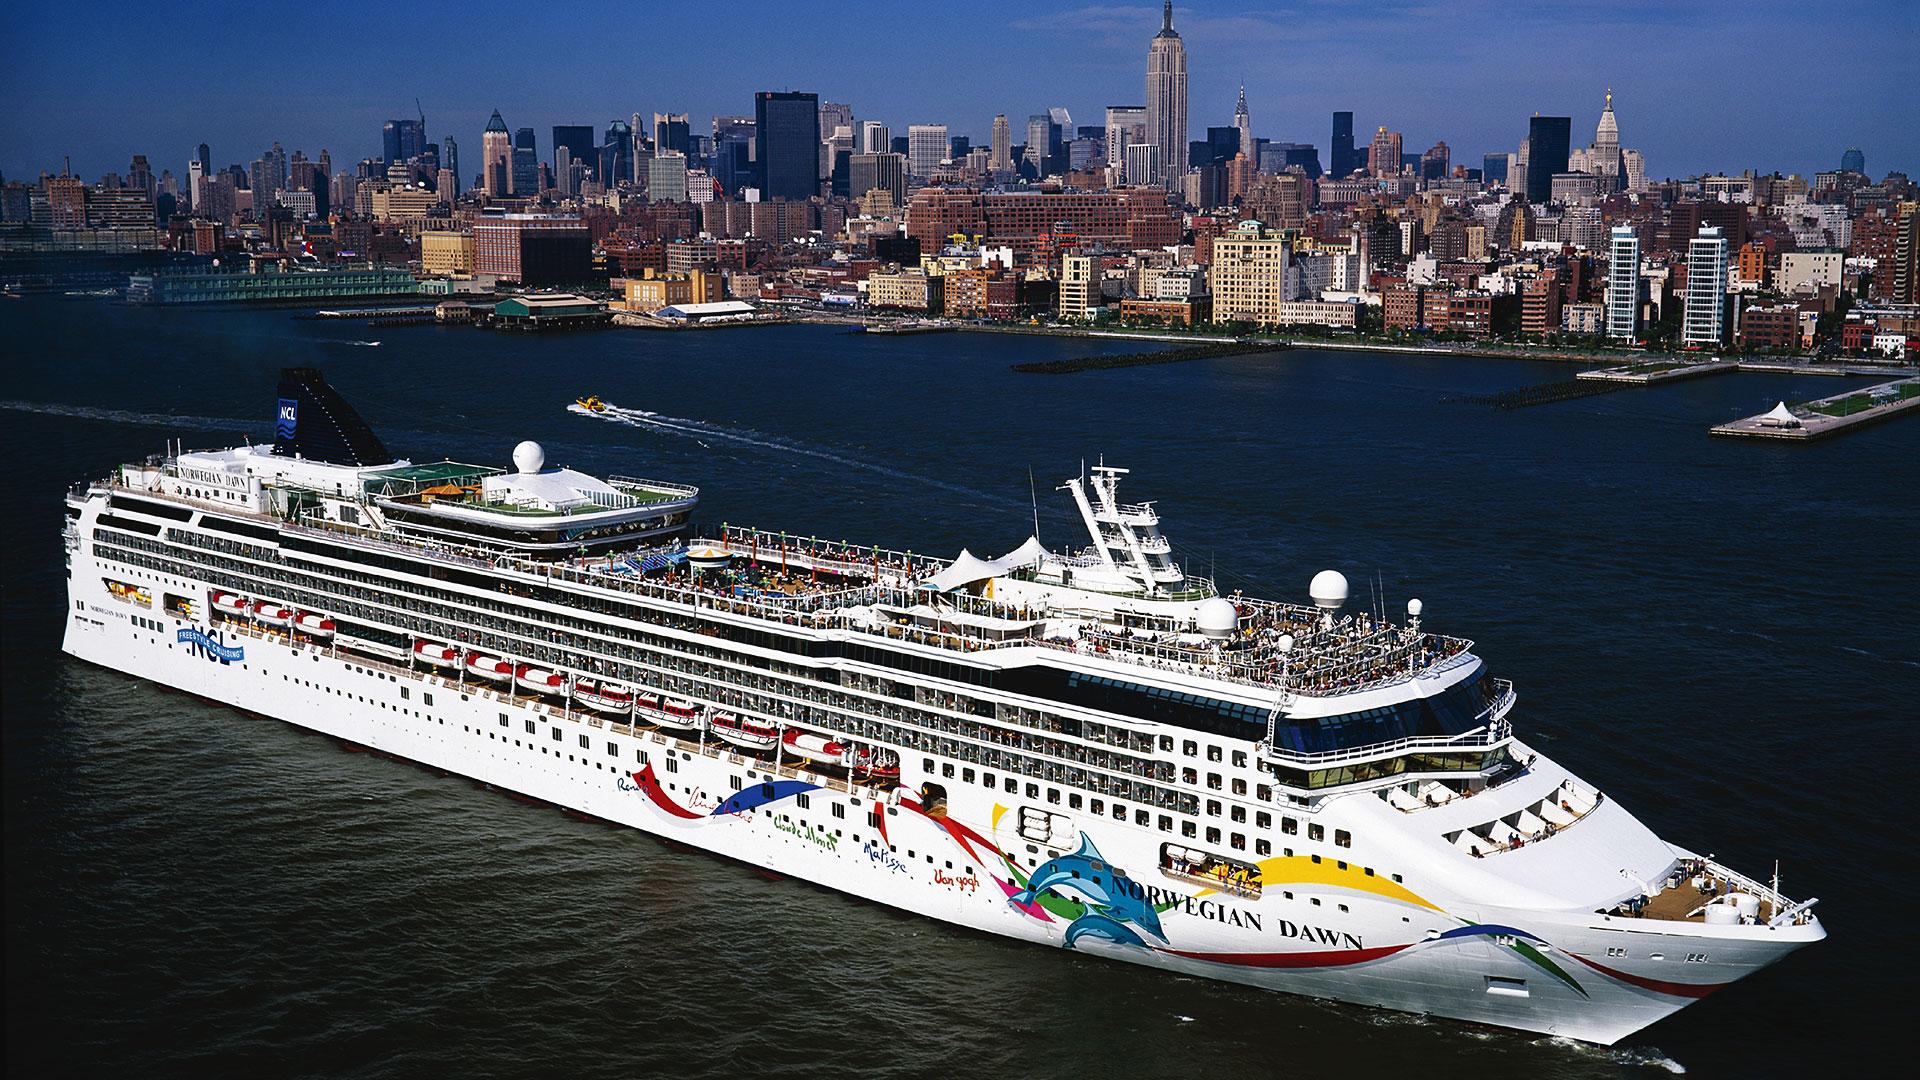 Cruise Ship Full HD Desktop Wallpaper [1920x1080 wallpaper 36 of 51 1920x1080